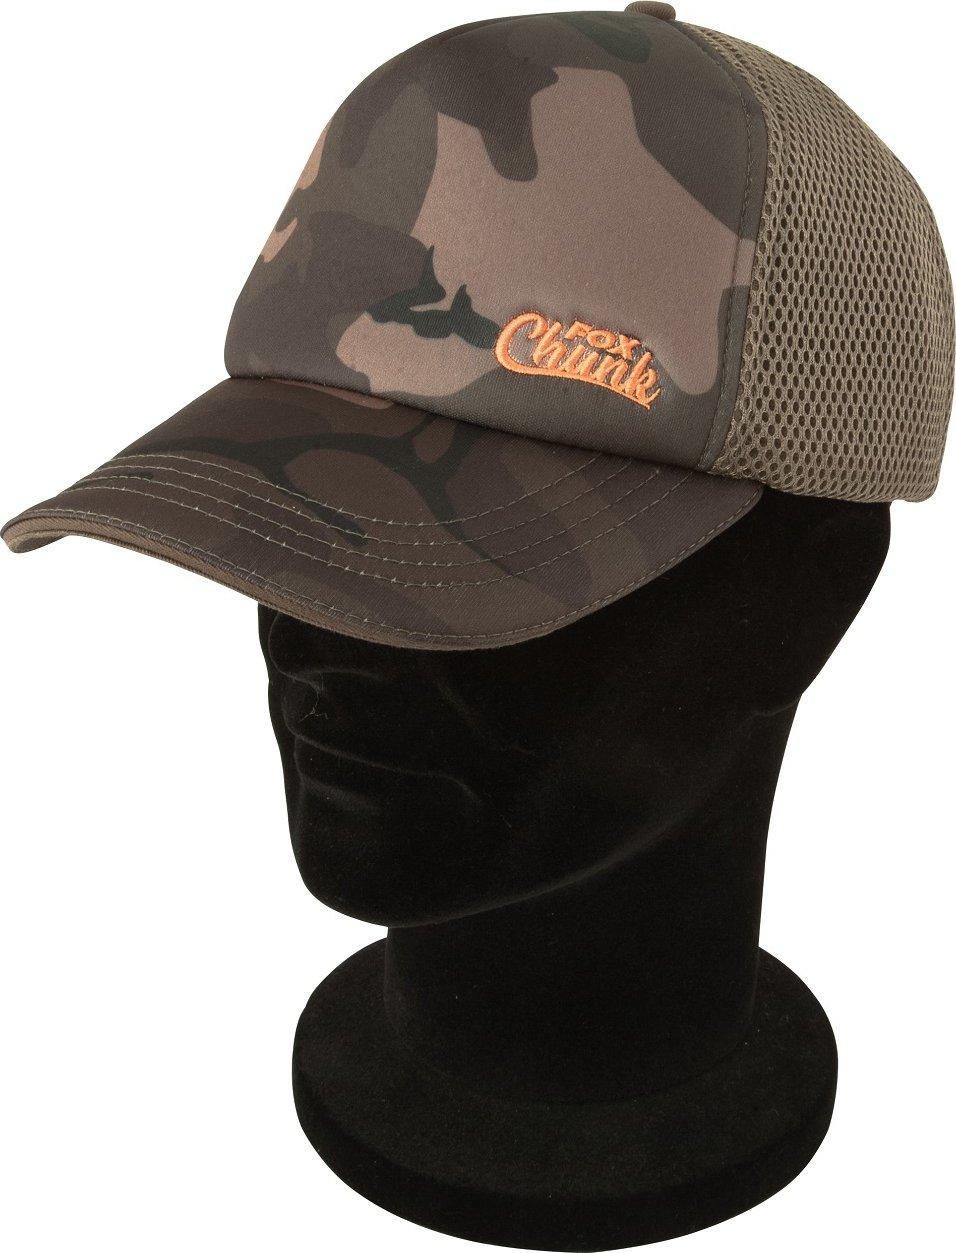 FOX Chunk Camo Mesh Back Baseball Cap od 399 Kč • Zboží.cz 72b26b9d94